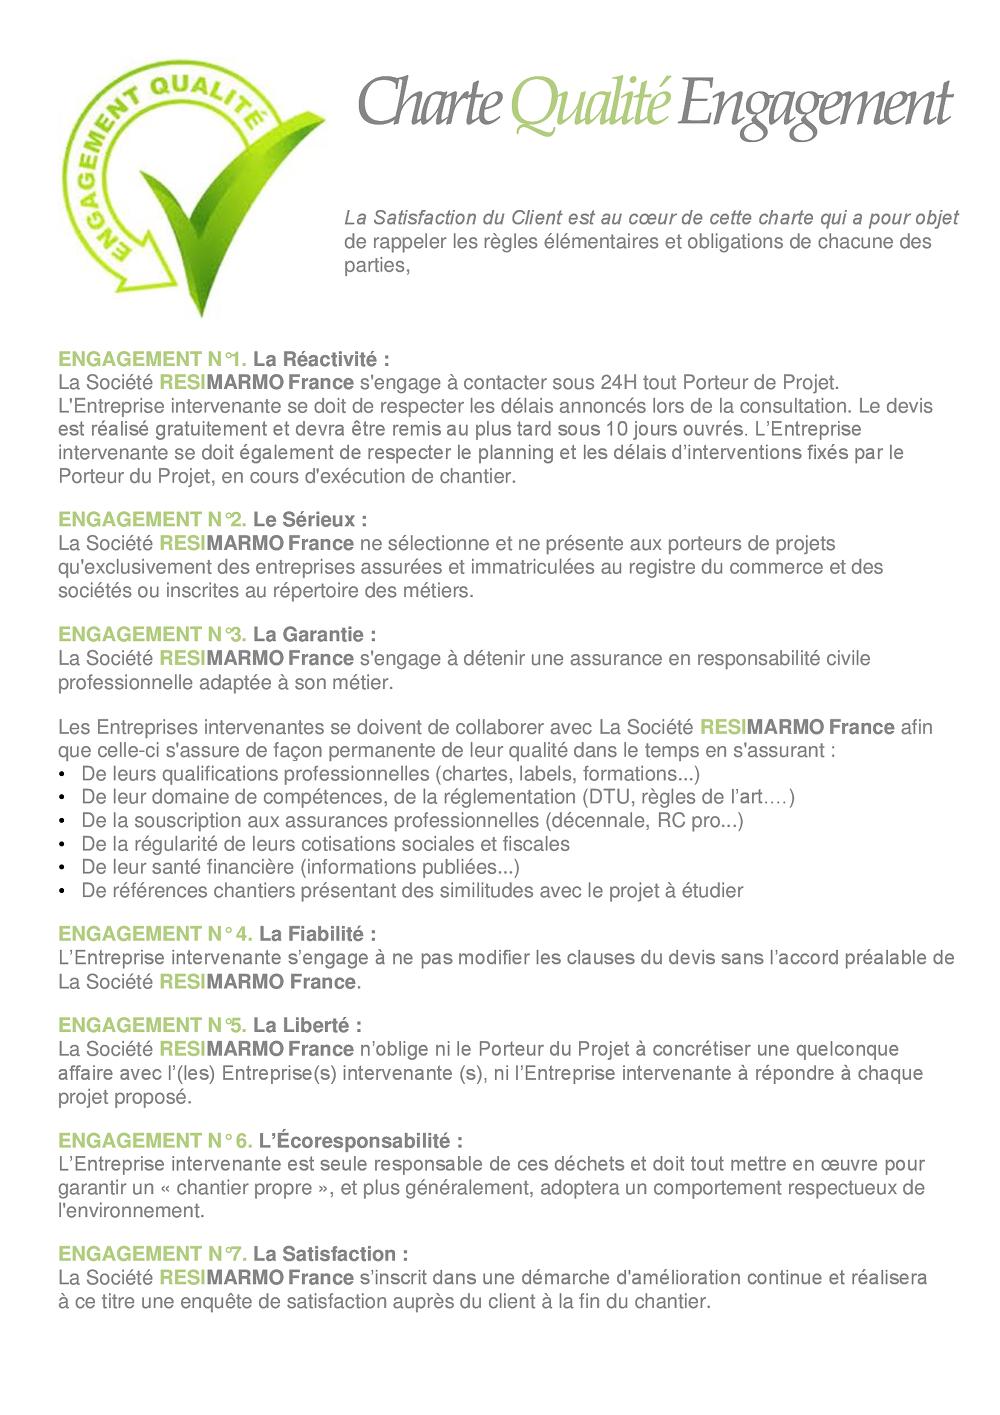 Charte qualité - Engagement RESIMARMO